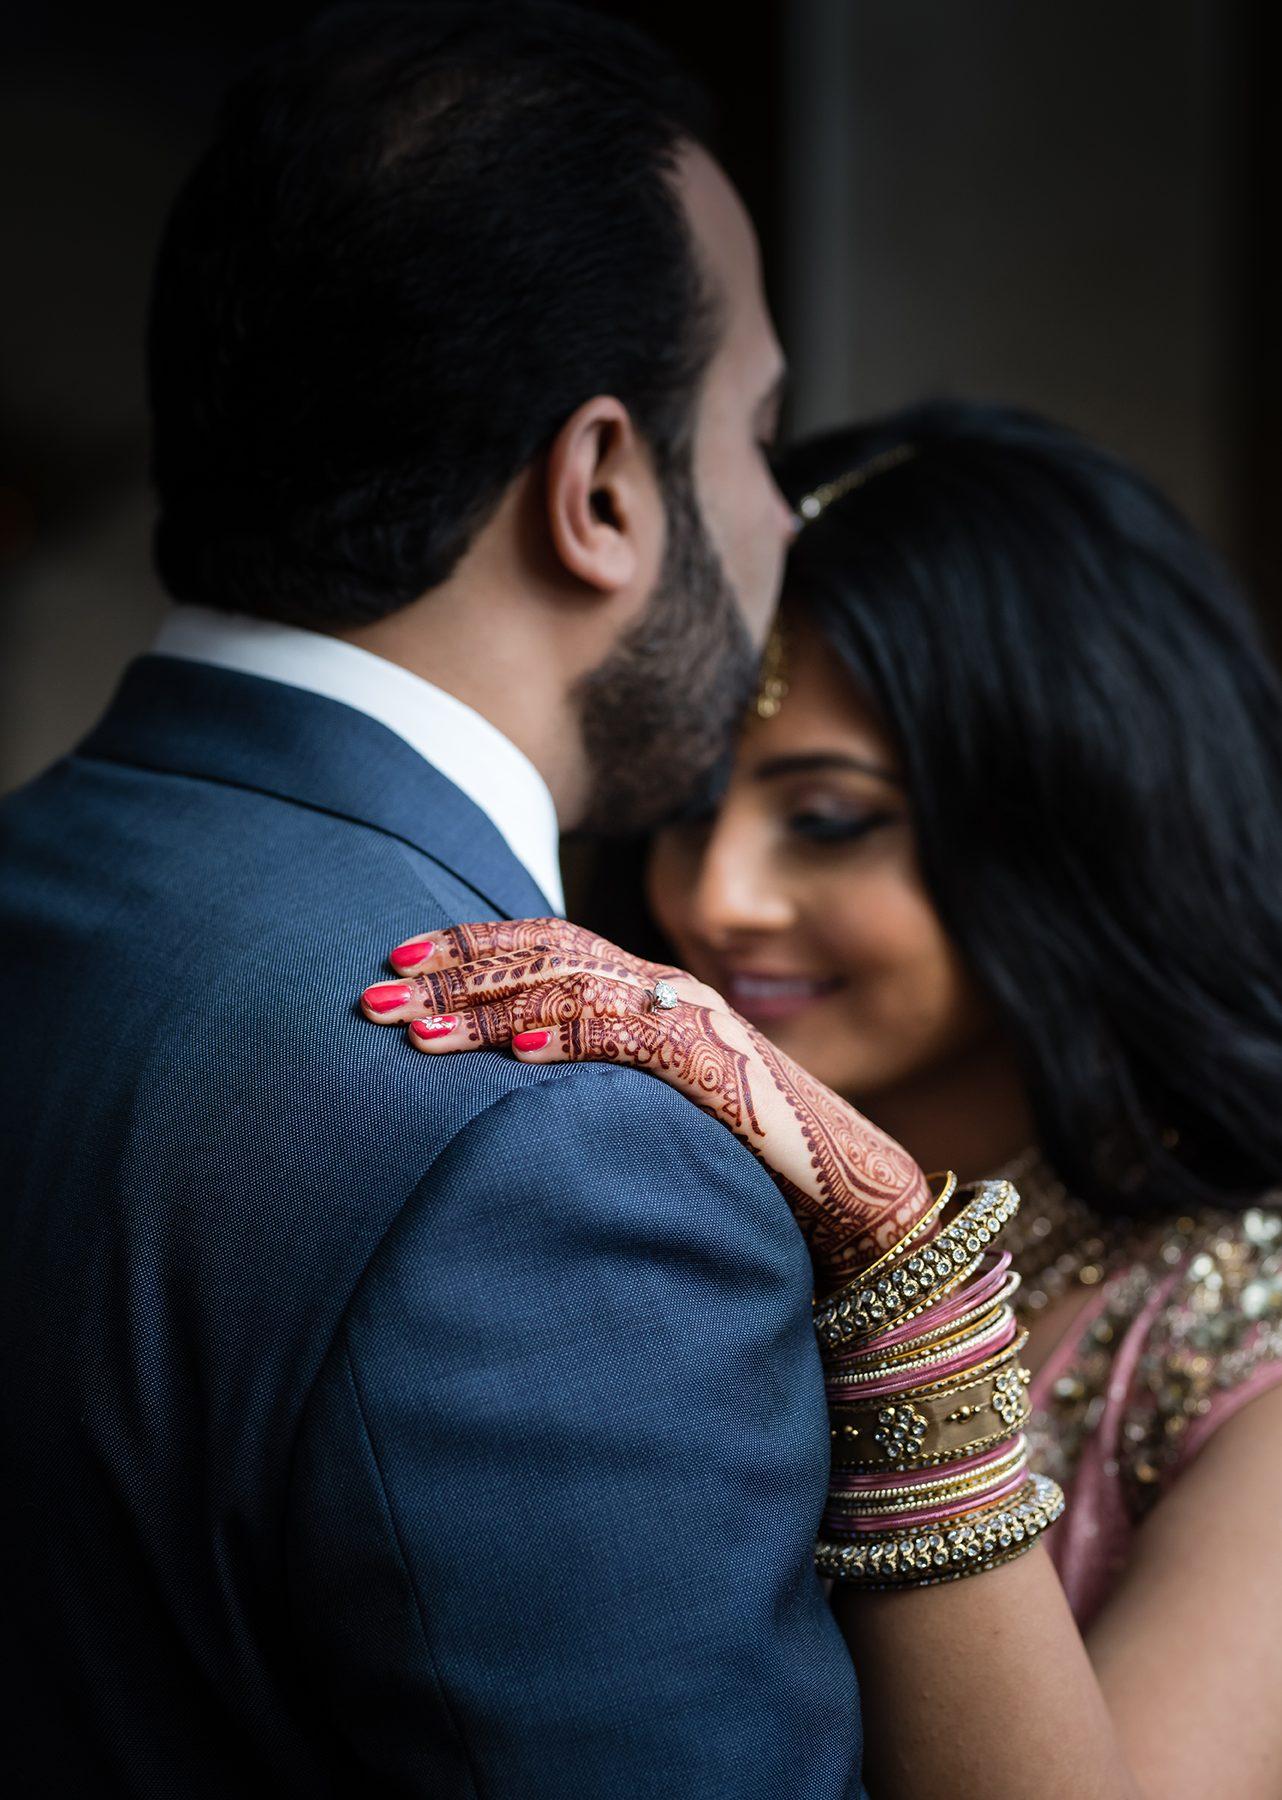 south_asian_wedding_photography_dhoom_studio_new_york42-1282x1800 SOUTH ASIAN WEDDINGS